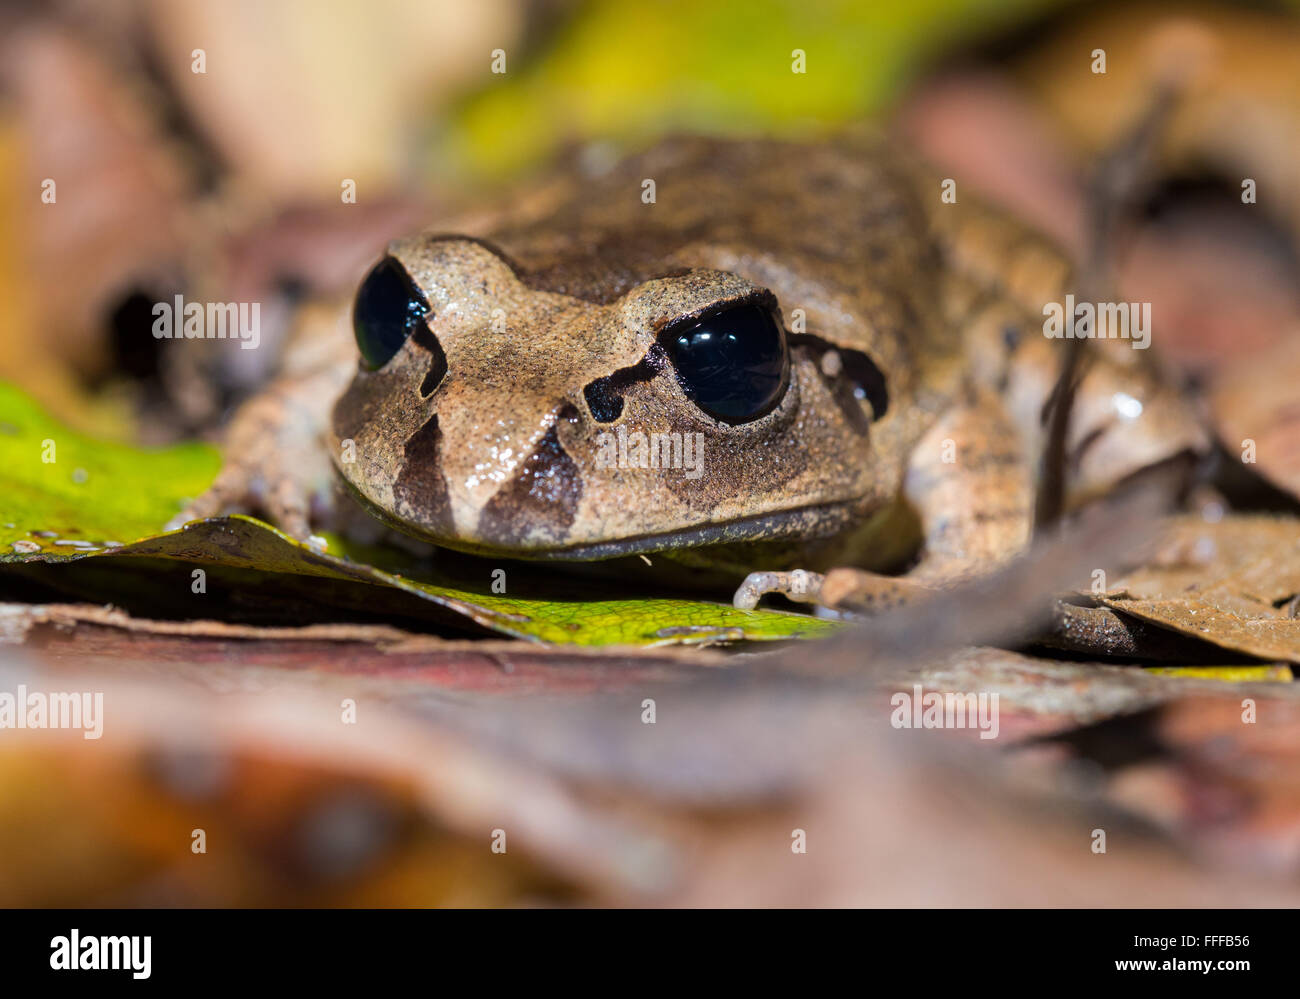 Great Barred Frog (Mixophyes fasciolatus), Nightcap National Park, NSW, Australia - Stock Image